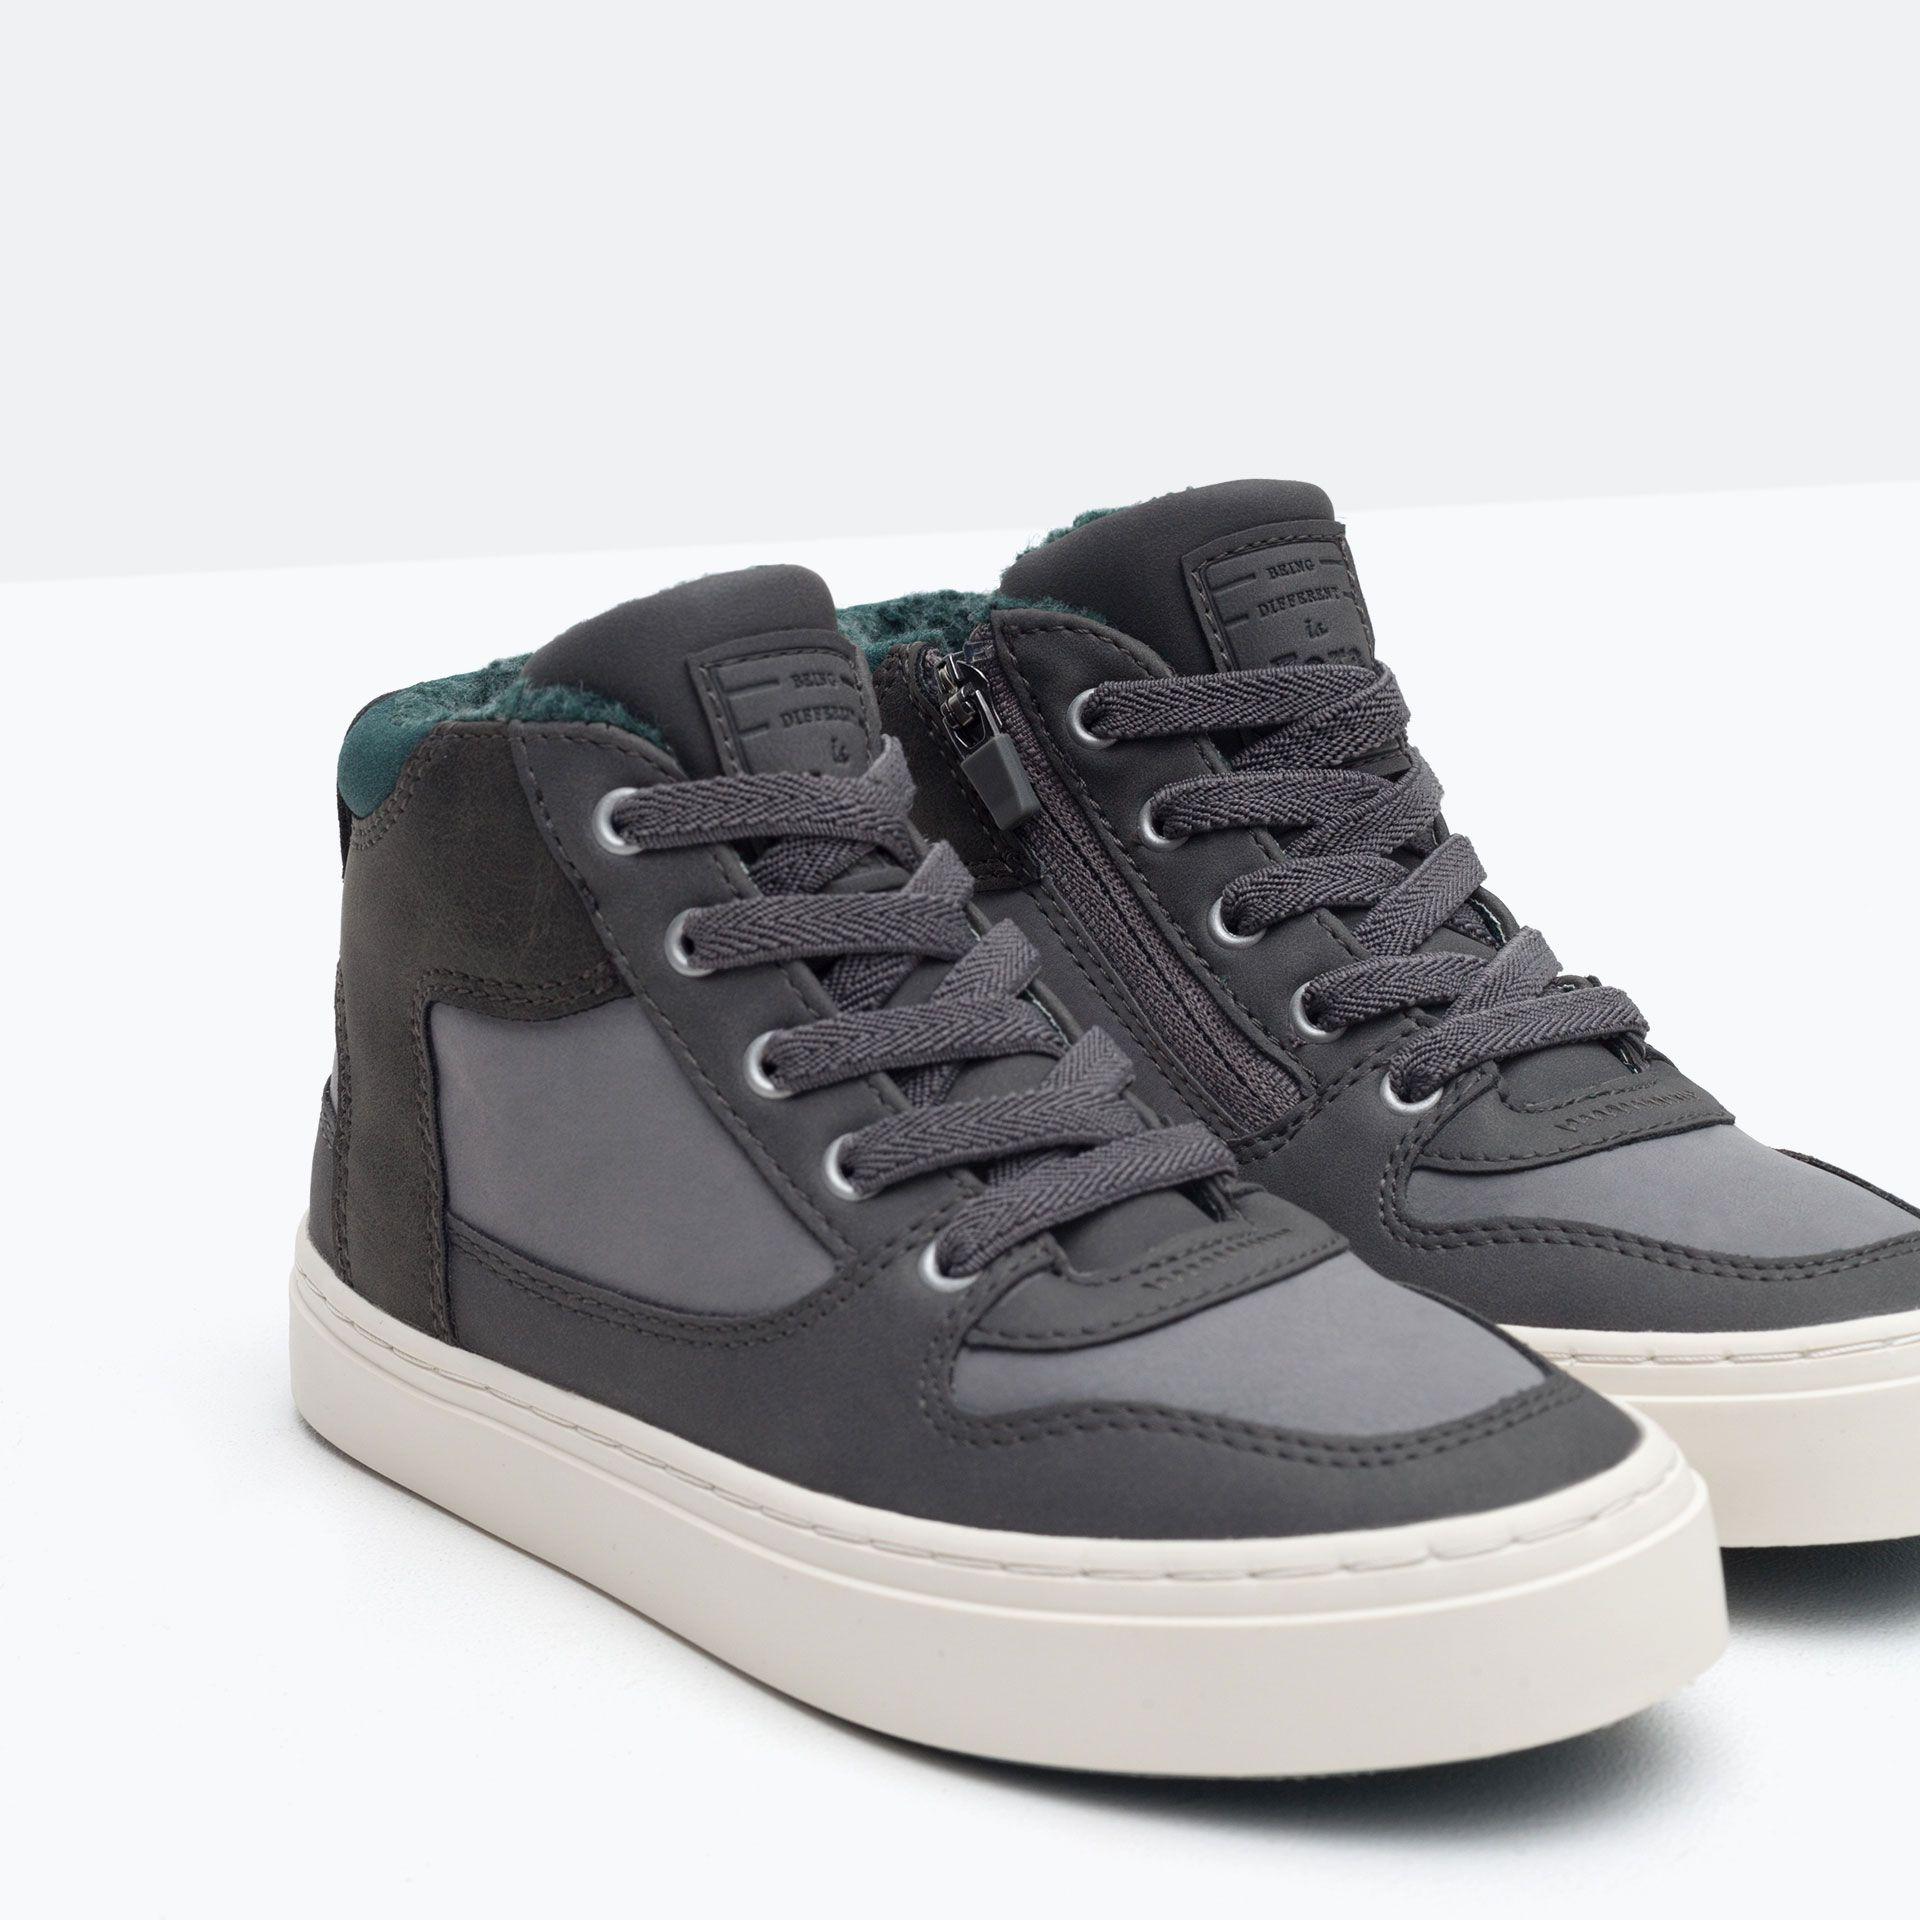 5b16a6fd Zara Kids Niños Zapatos Zapatos Para Basket Shoes Urbana rardxwIqA